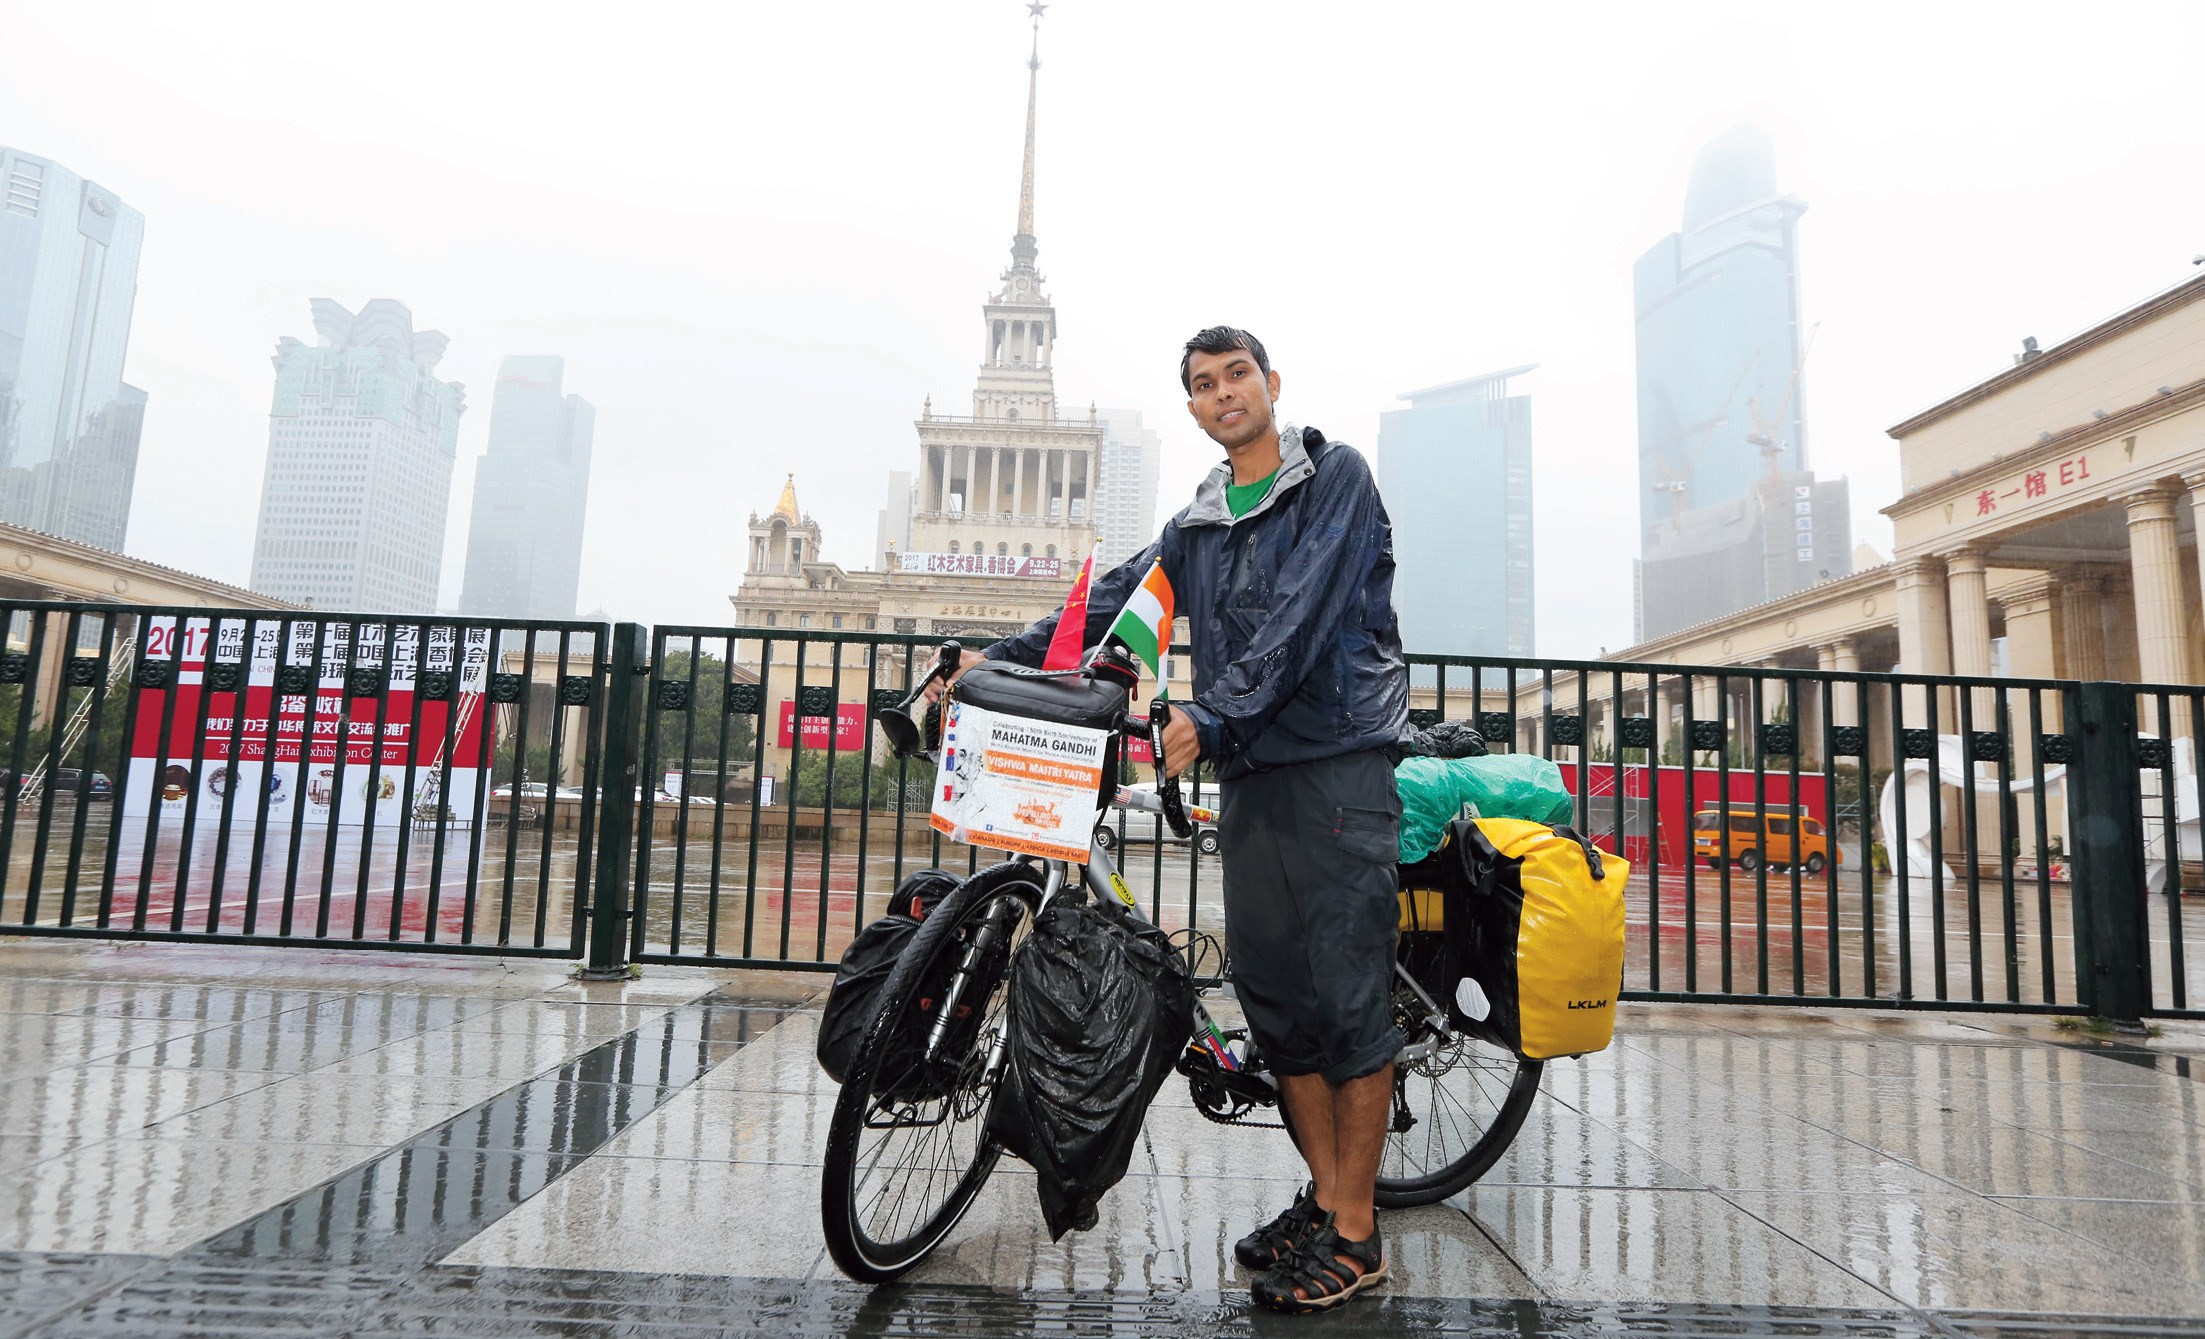 Dnyaneshwar Yeotkar poses in front of the Shanghai Exhibition Center. — Wang Rongjiang